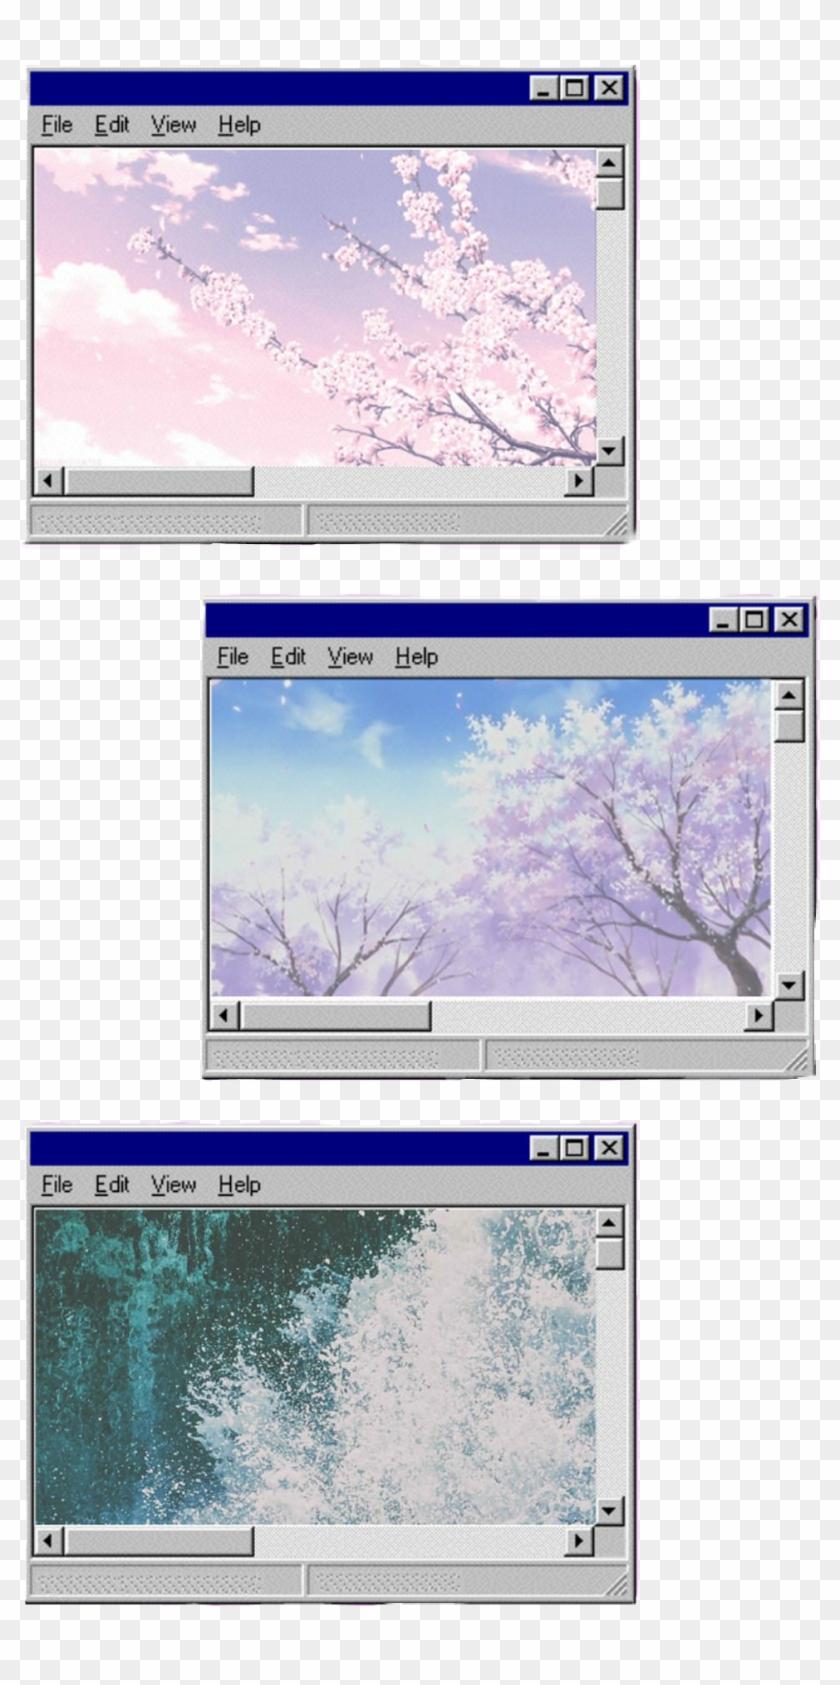 windows #windows98 #aesthetic #tumblr #computer - Windows 98